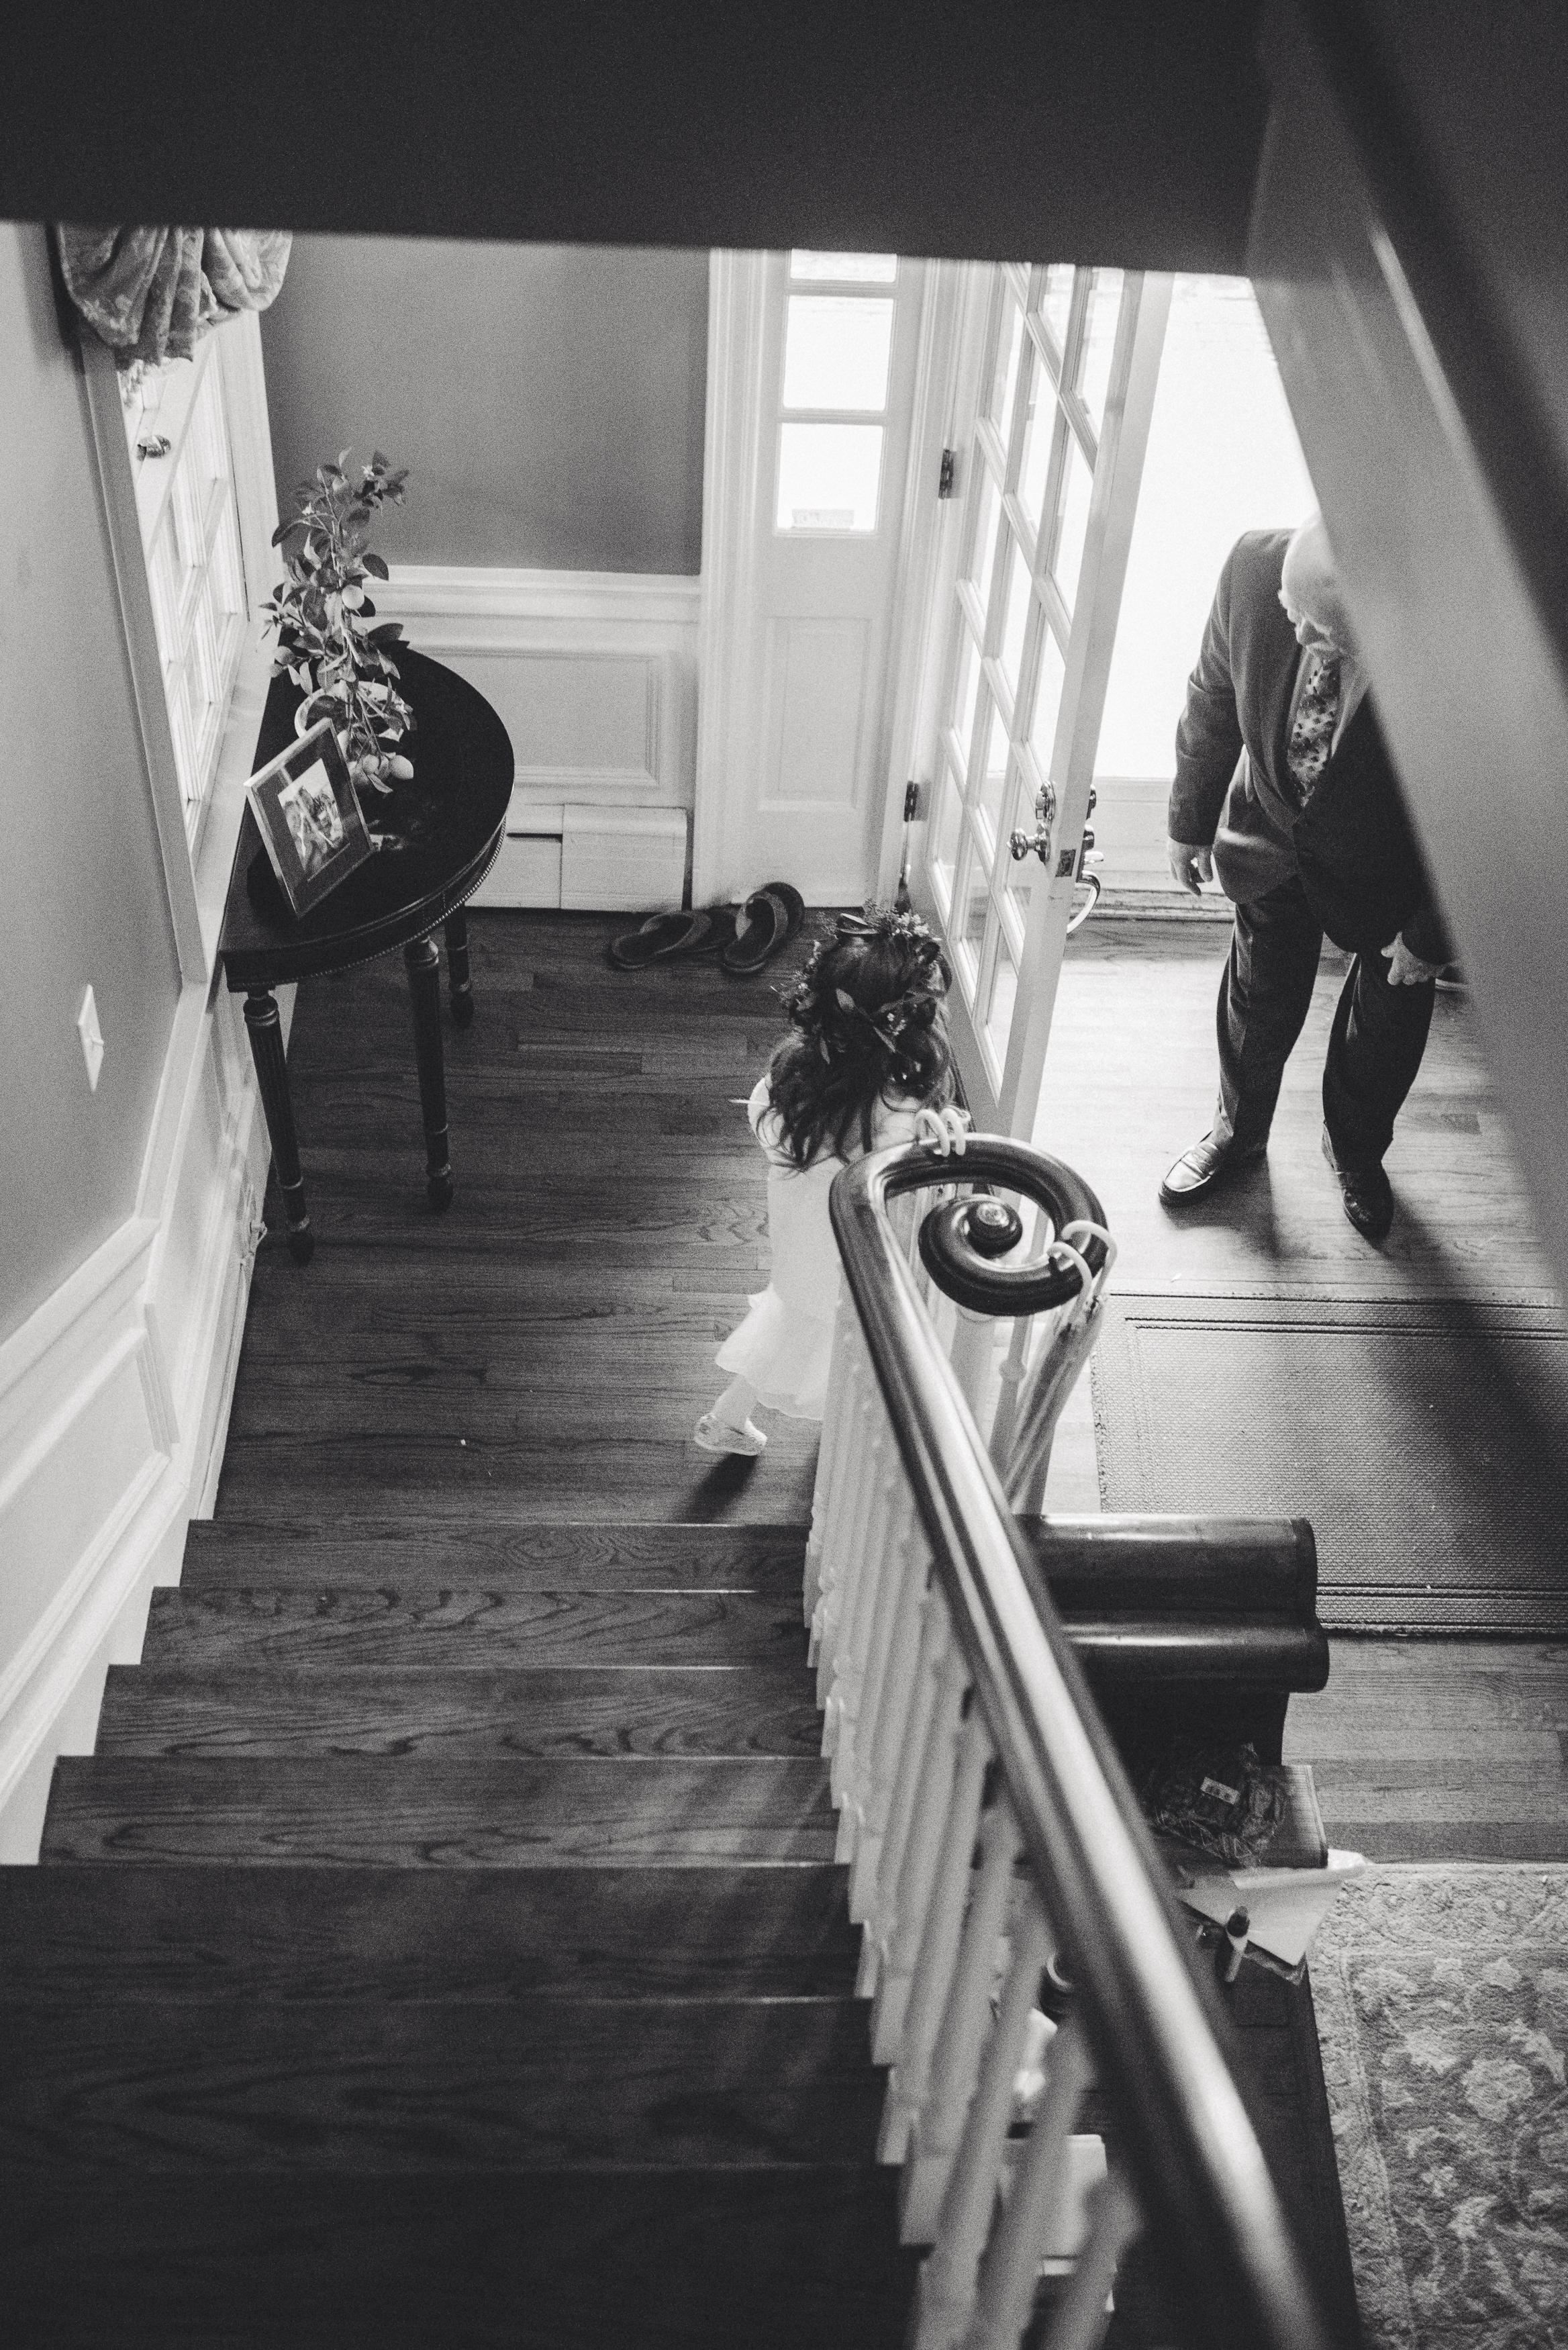 JACQUELINE & ANDREW WARSHAWER -BROOKMILL FARM FALL WEDDING - INTIMATE WEDDING PHOTOGRAPHER - TWOTWENTY by CHI-CHI AGBIM-118.jpg